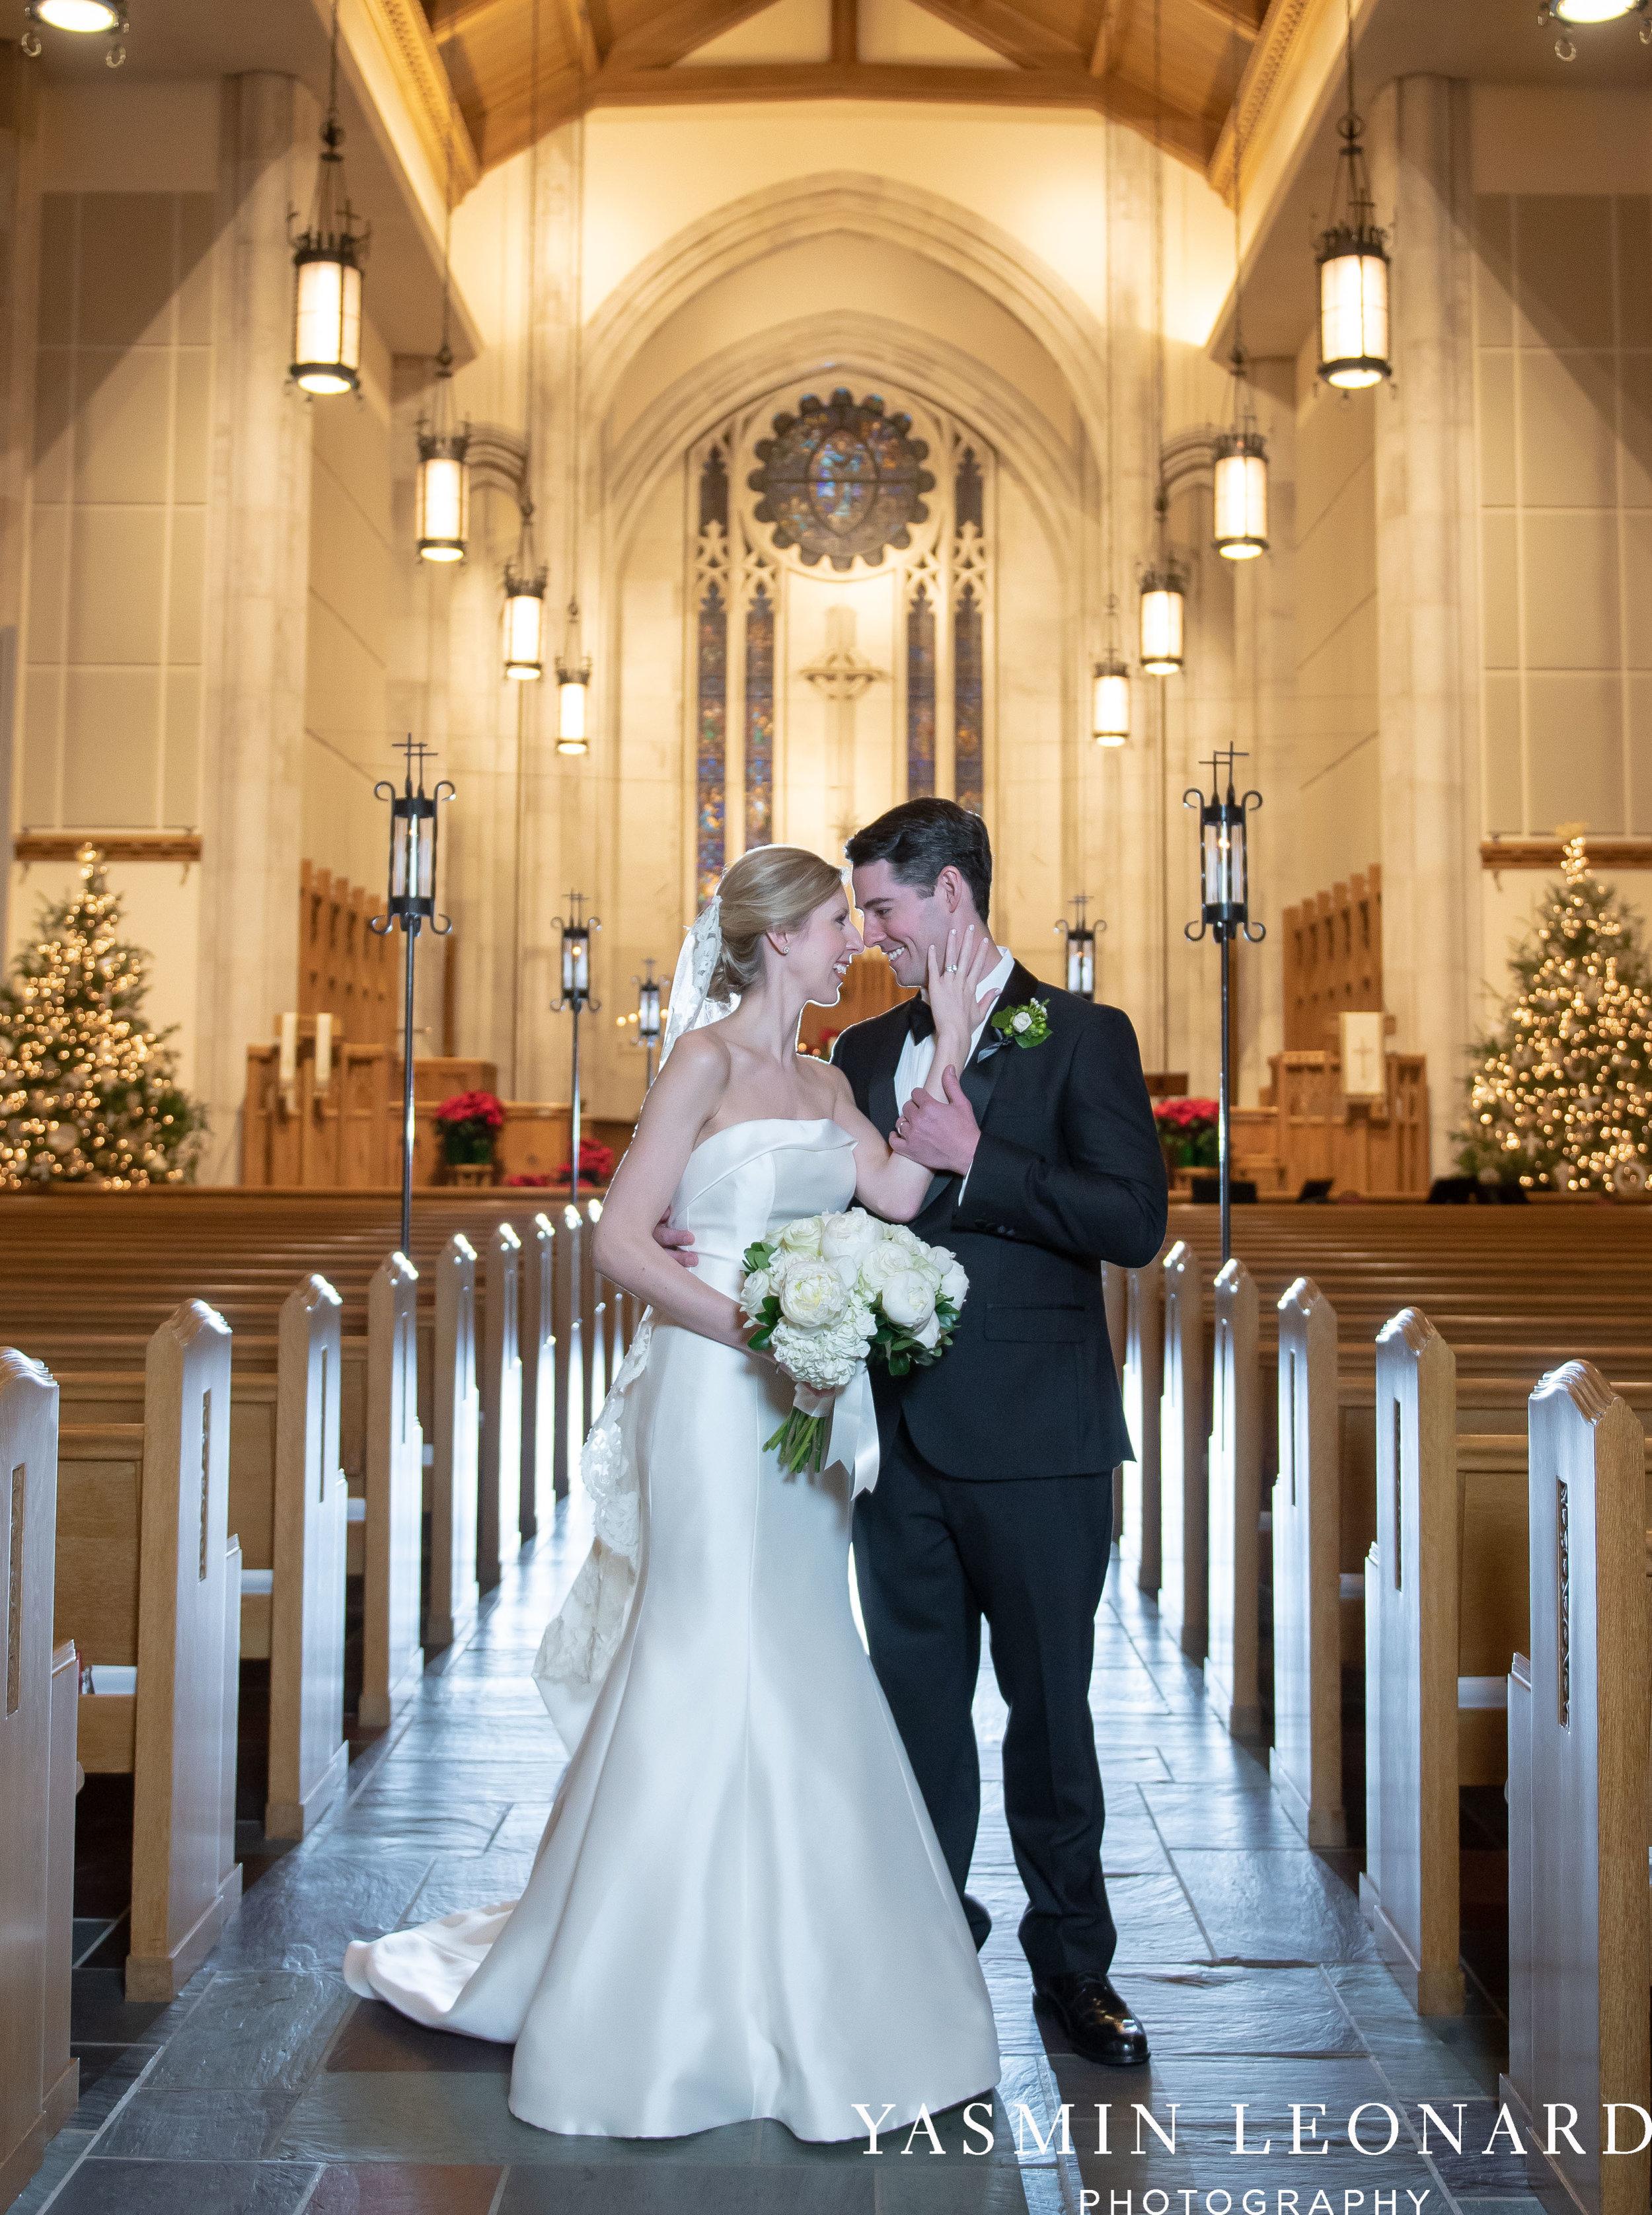 Wesley Memorial UMC - High Point Country Club - Emerywood Country Club - High Point Weddings - High Point Wedding Photographer - Yasmin Leonard Photography-22.jpg